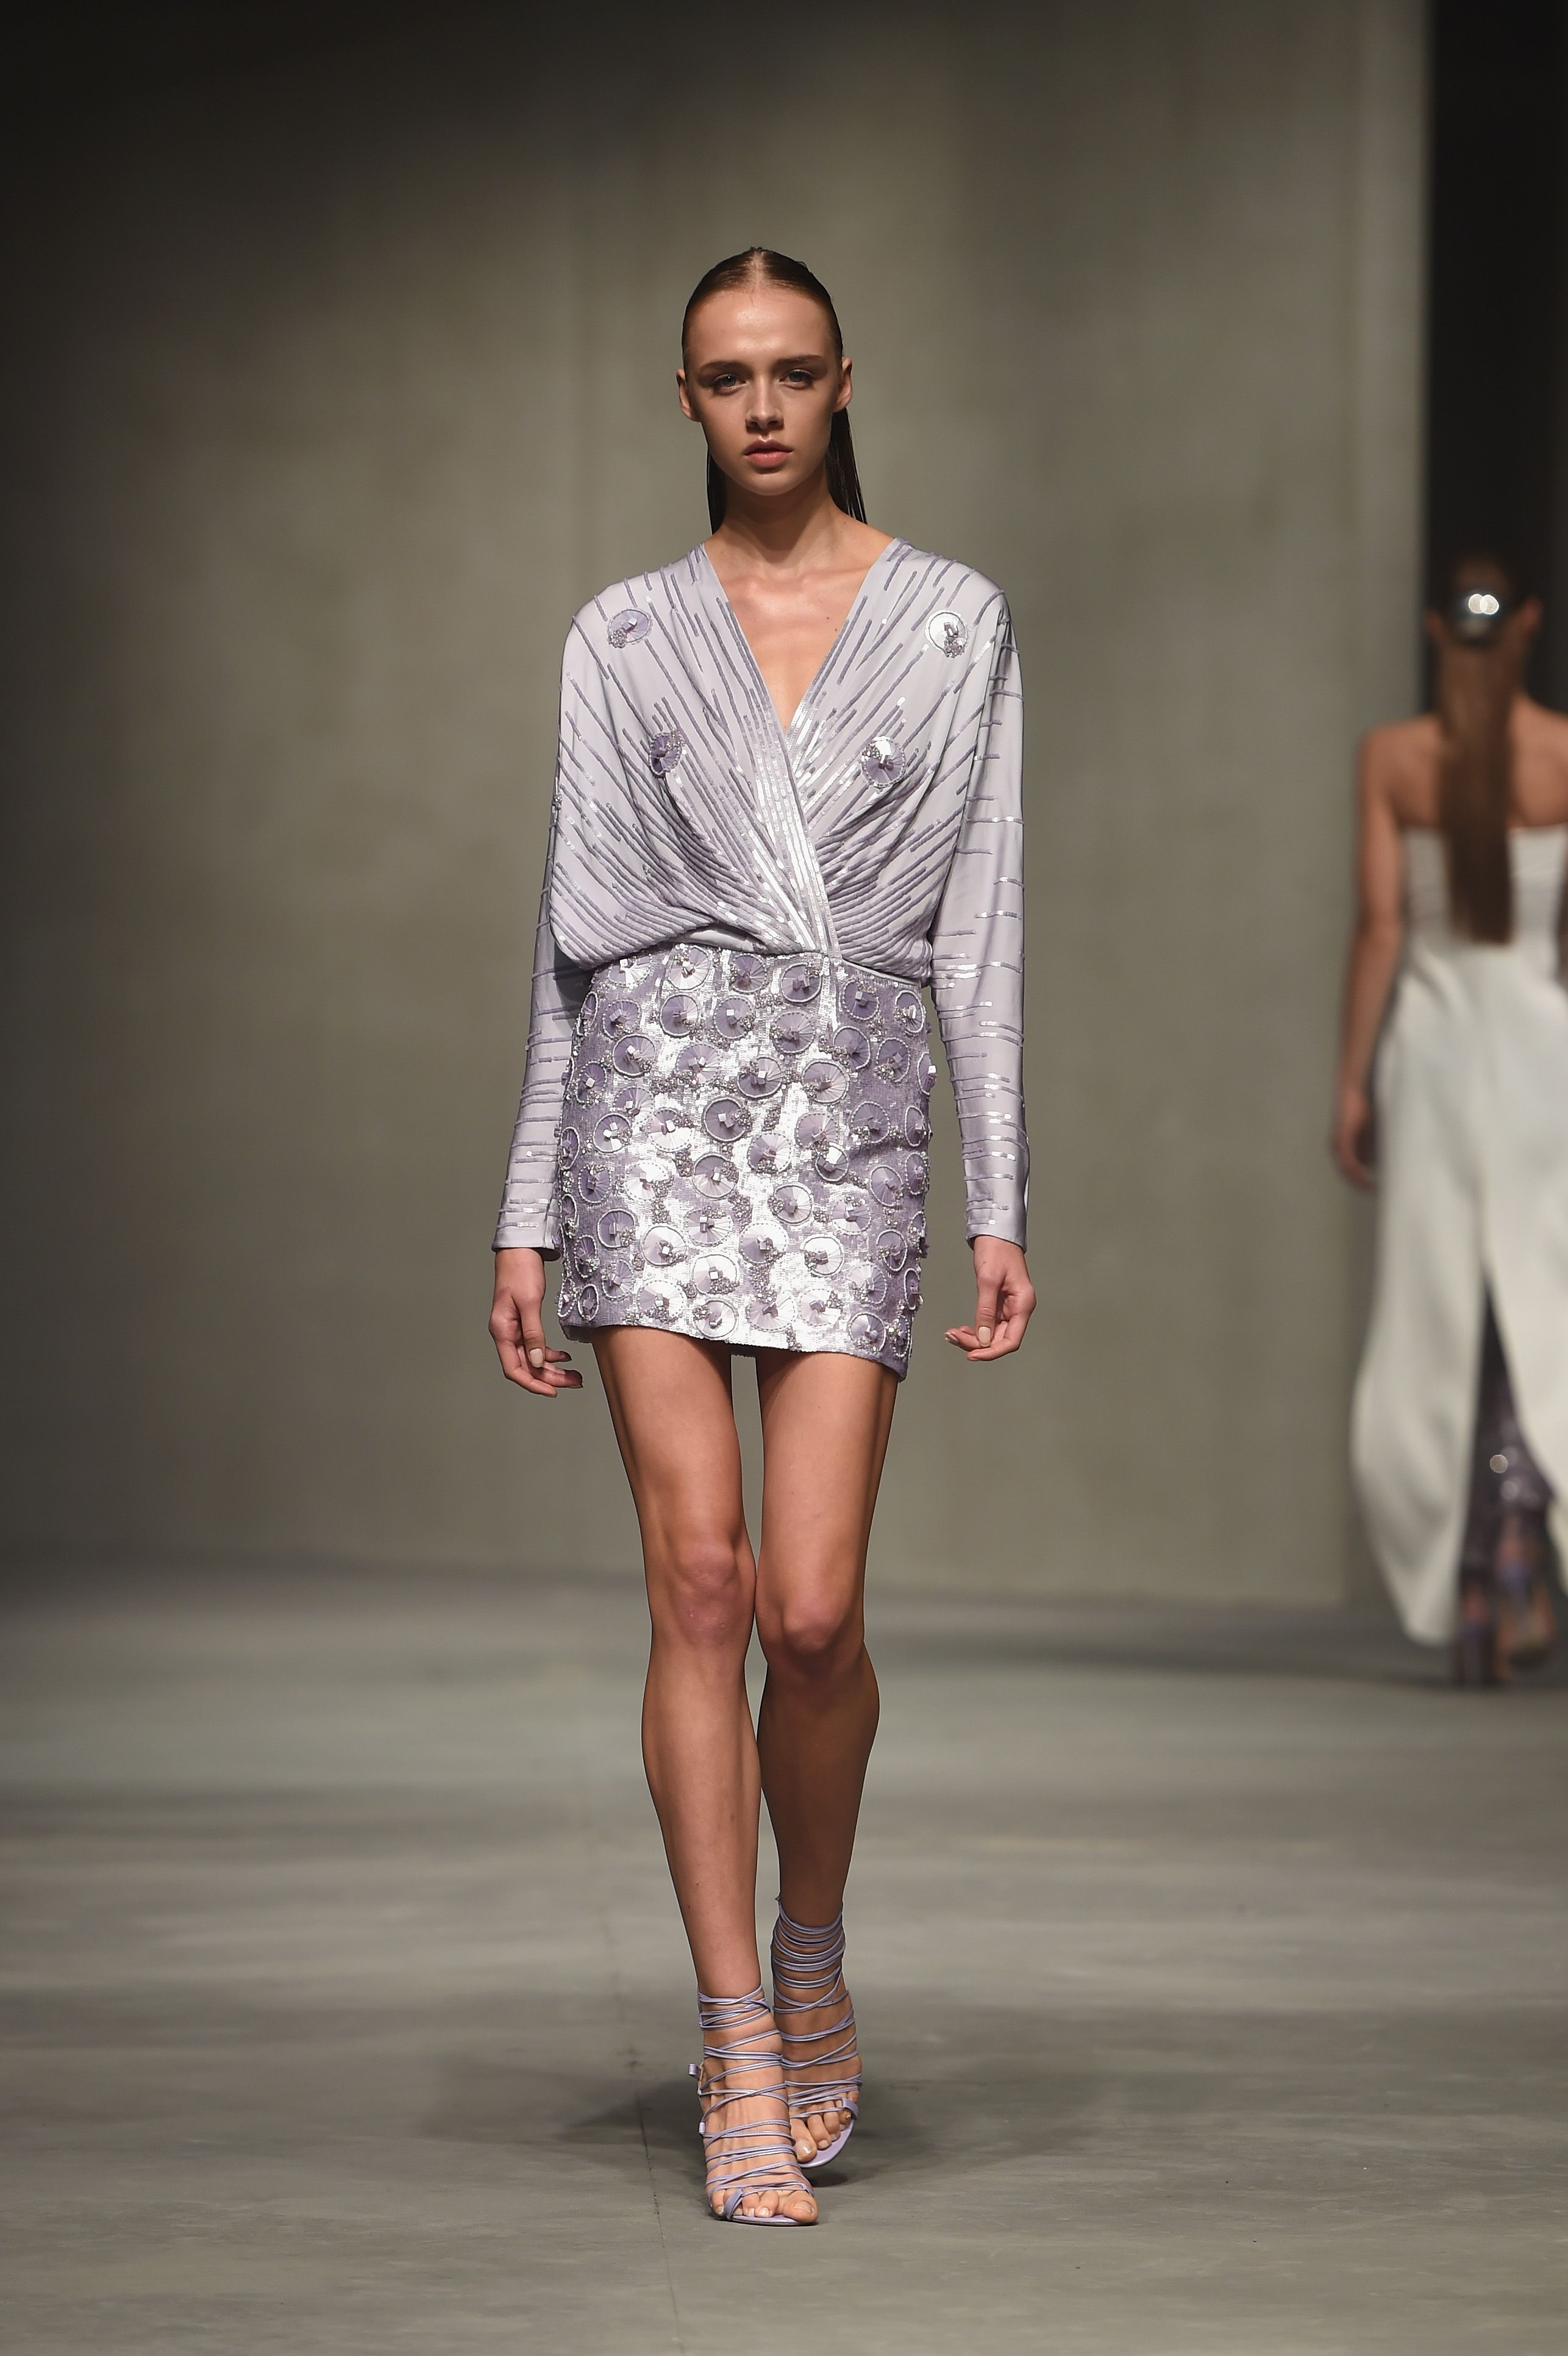 SS/15 Ozgur Masur | SS/15 | Pinterest | Ss 15, Ss and Fashion